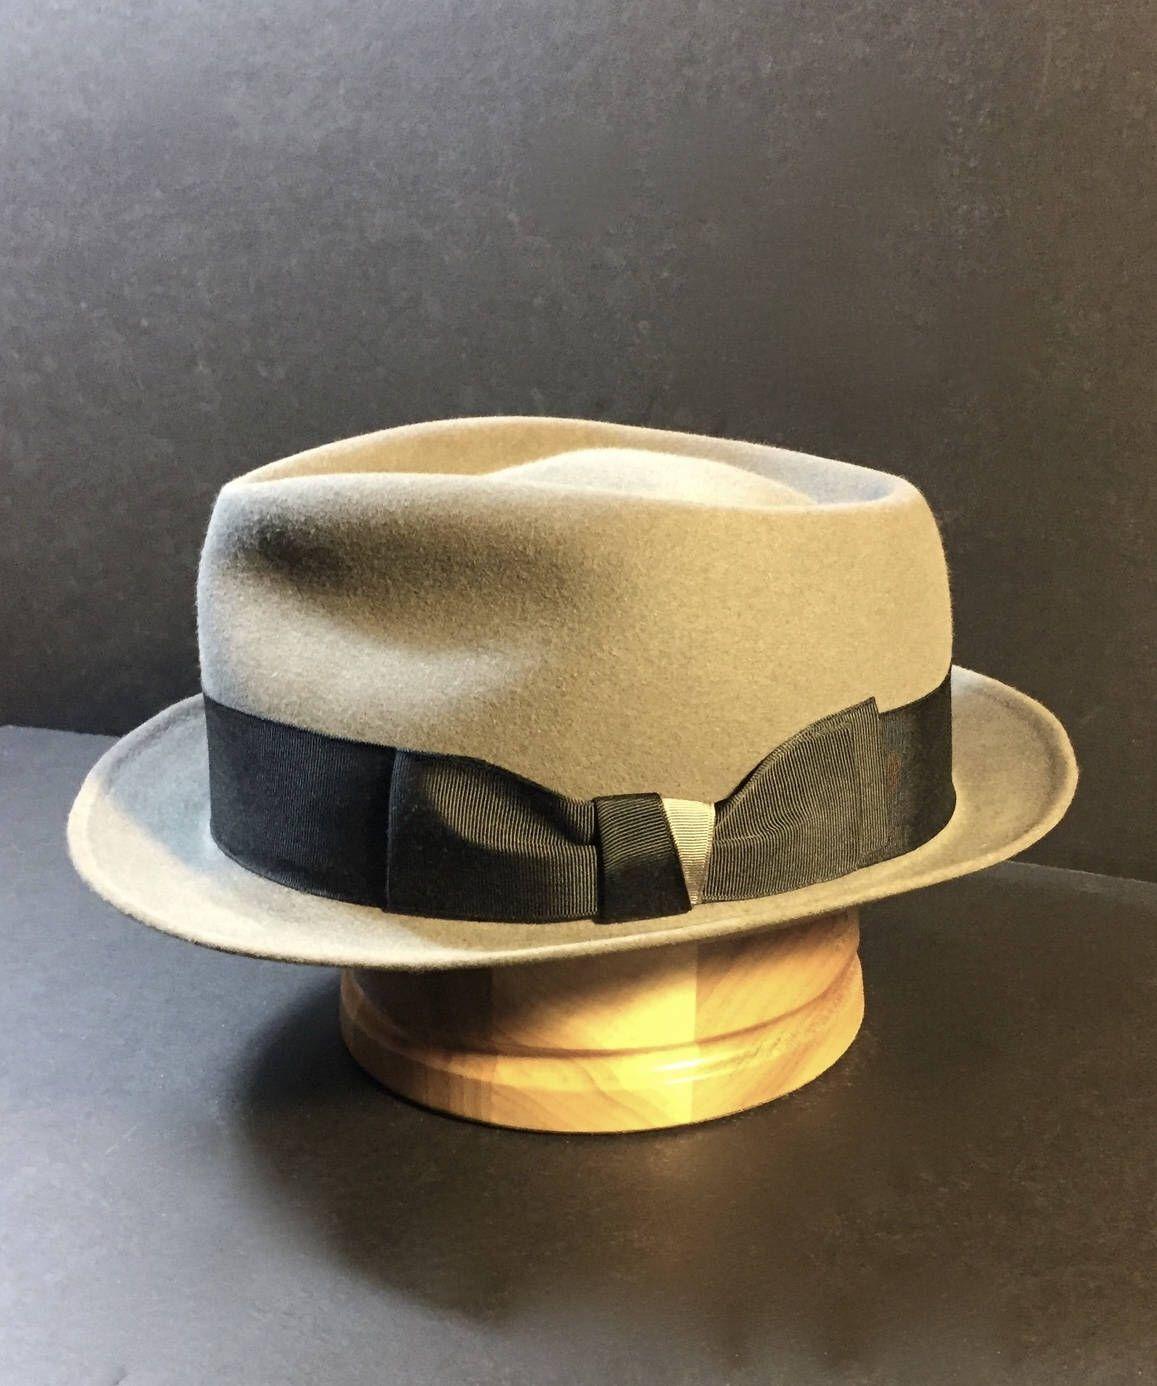 Panama Hat New Custom Made Semi Calado Straw Hat Fedora Size 7 1 4 58 Cm Hats For Men Hats Panama Hat